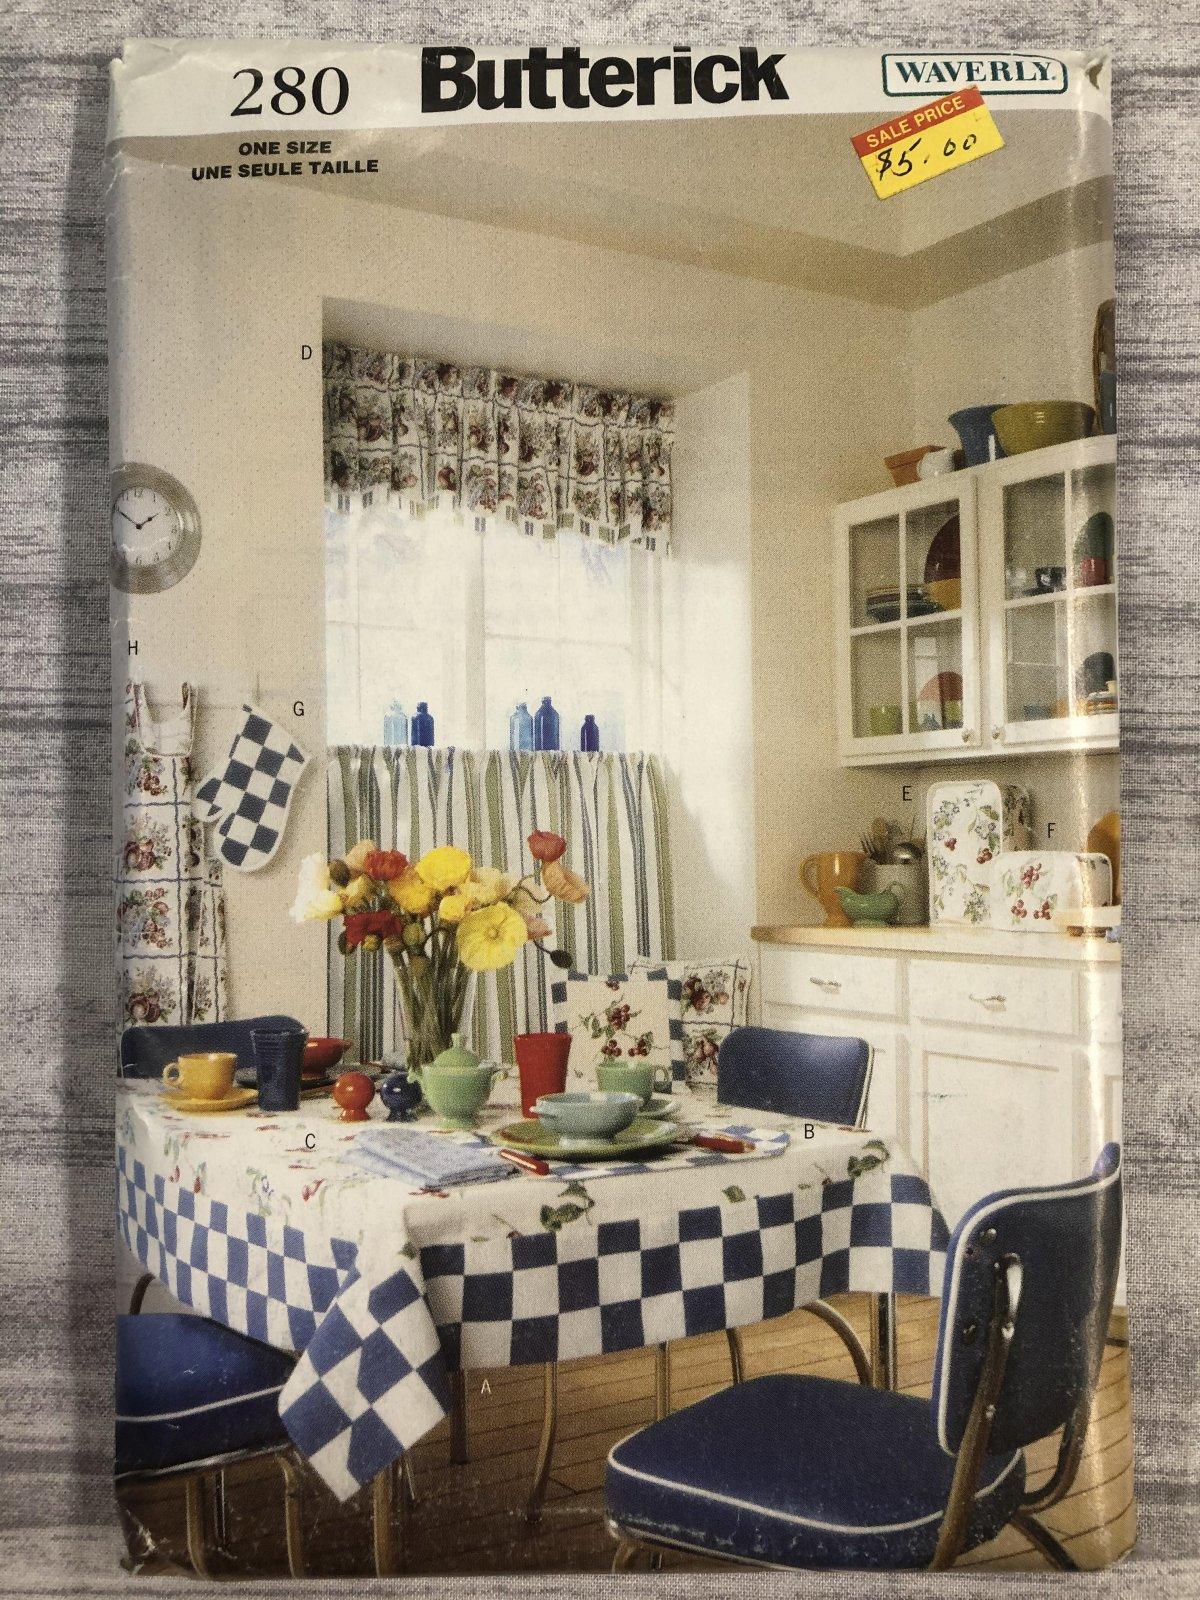 Butterick Waverly Kitchen 0280